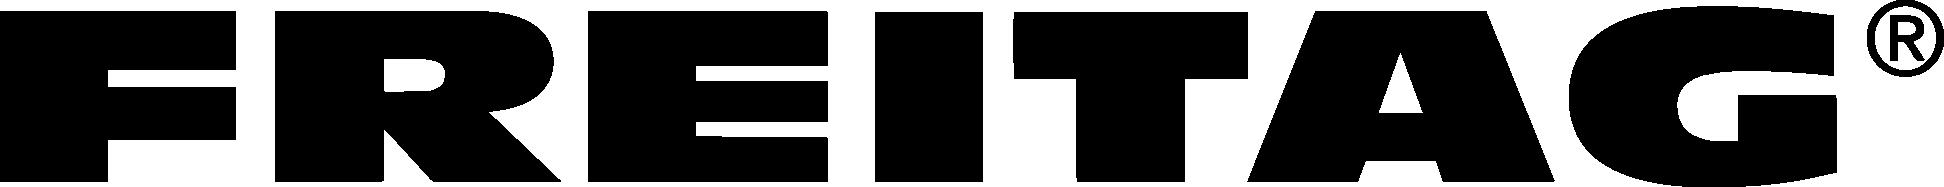 FREITAG-label-black